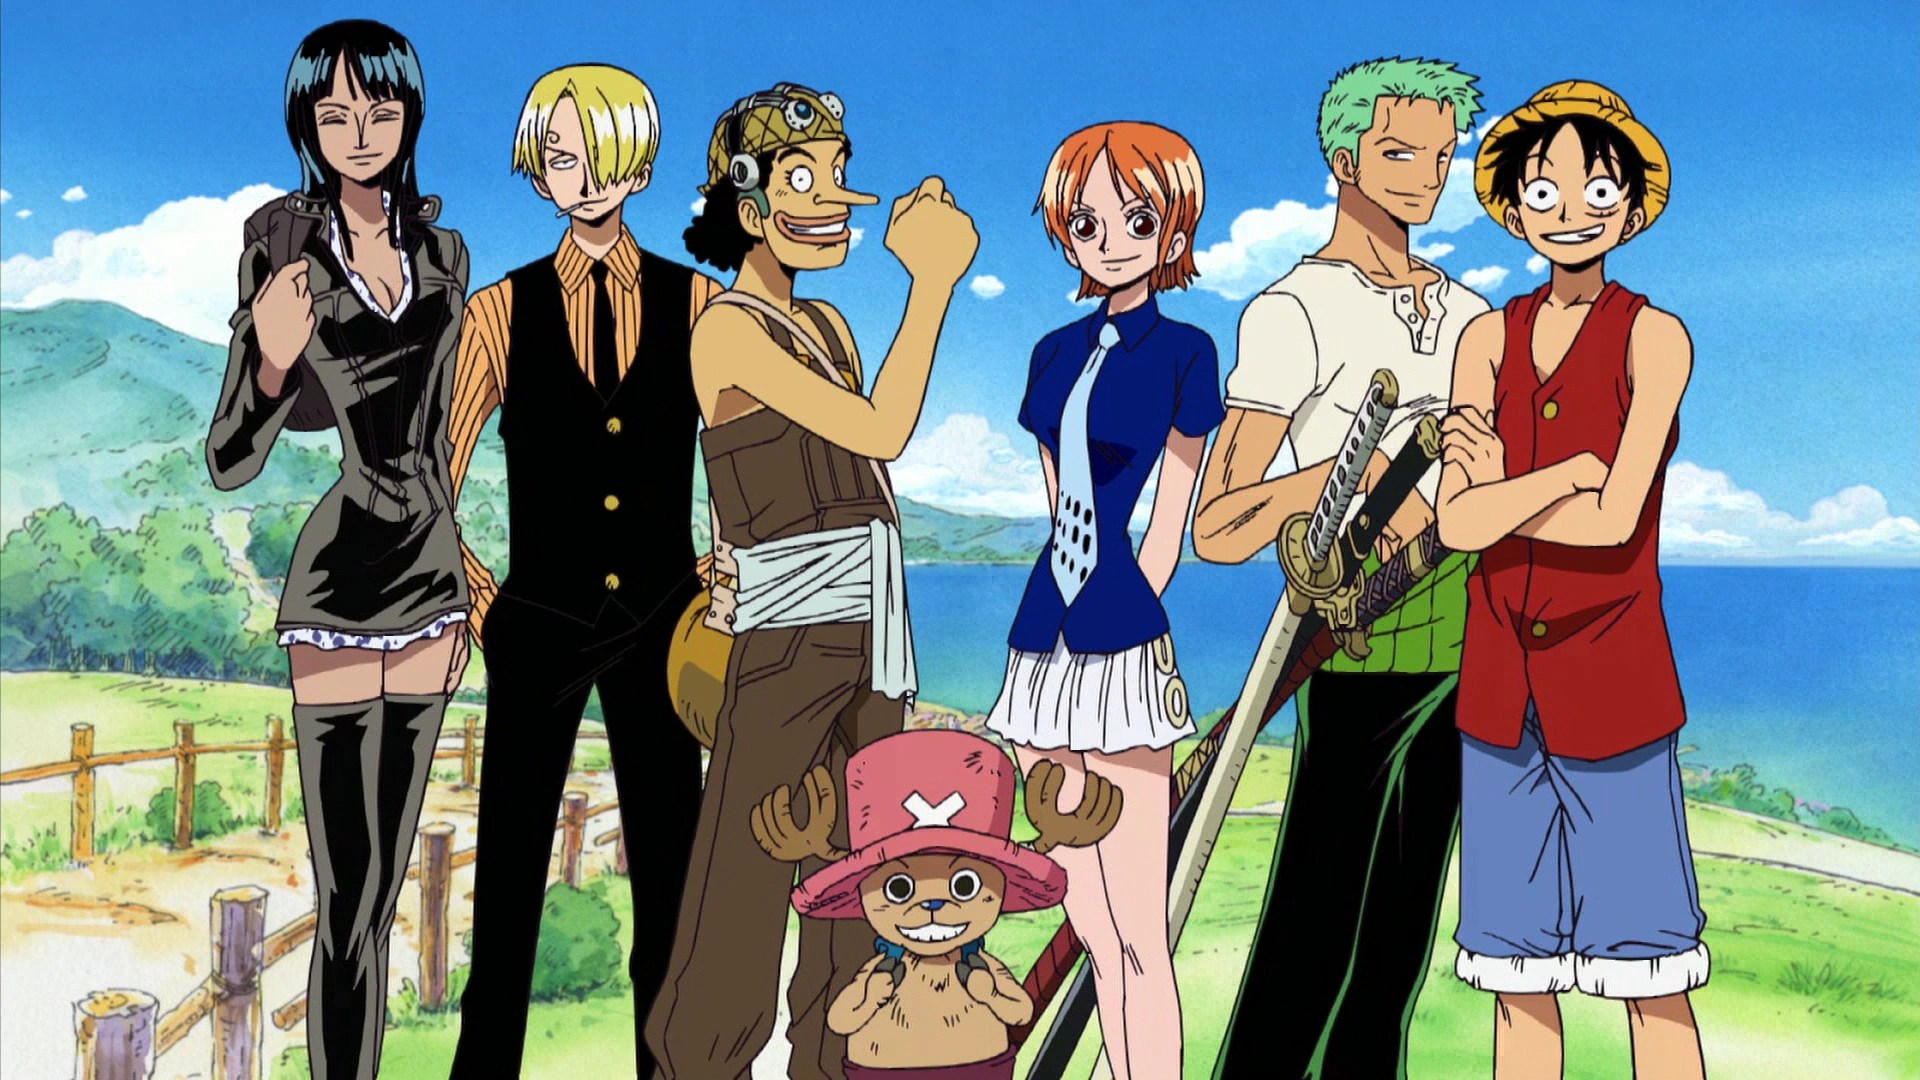 Eternal Pose (song) | One Piece Wiki | FANDOM powered by Wikia